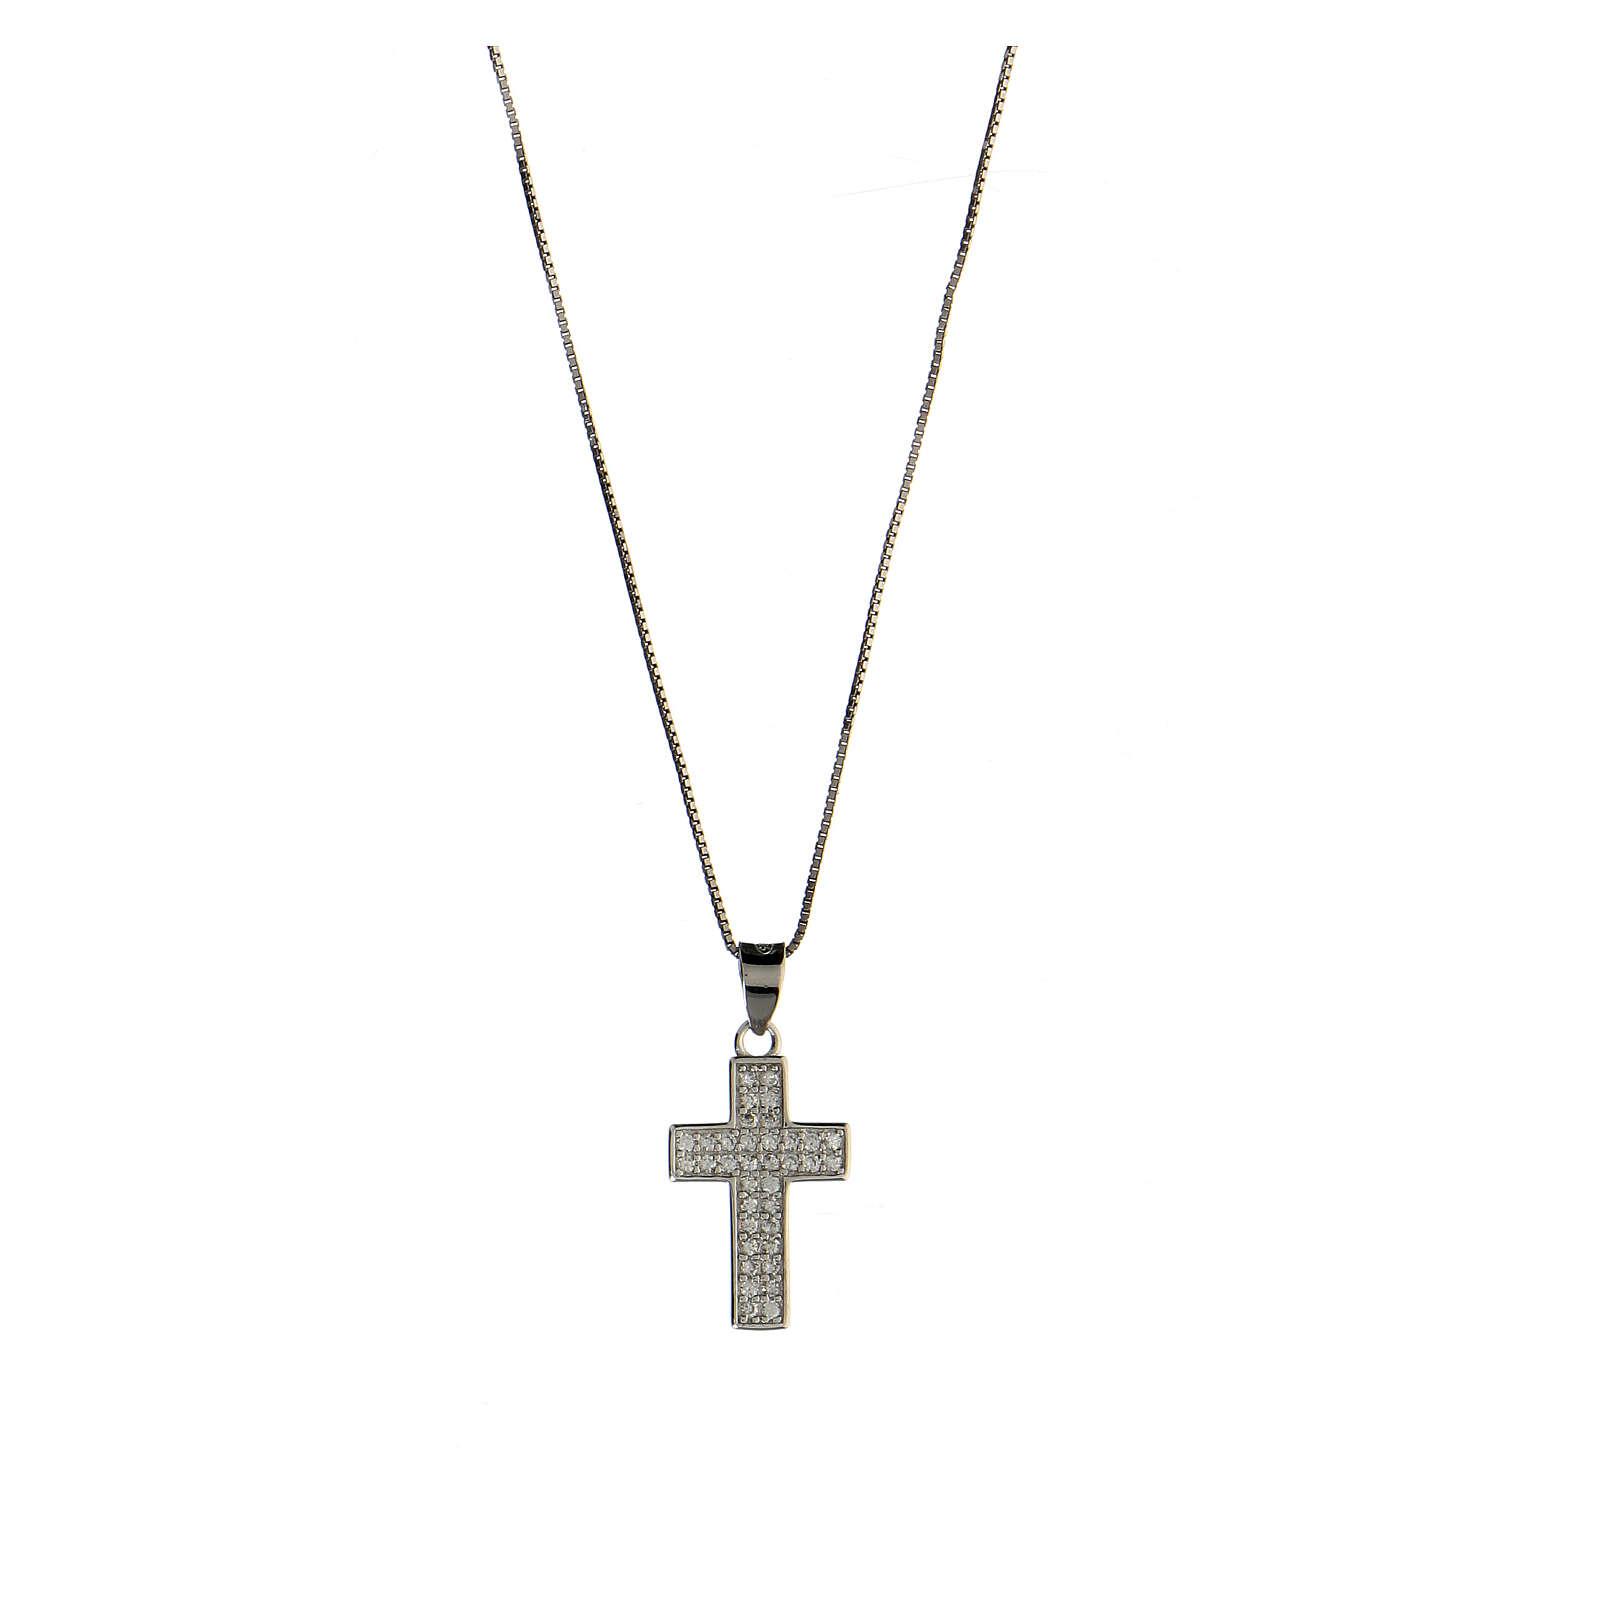 Collier croix latine argent 925 zircons blancs 4